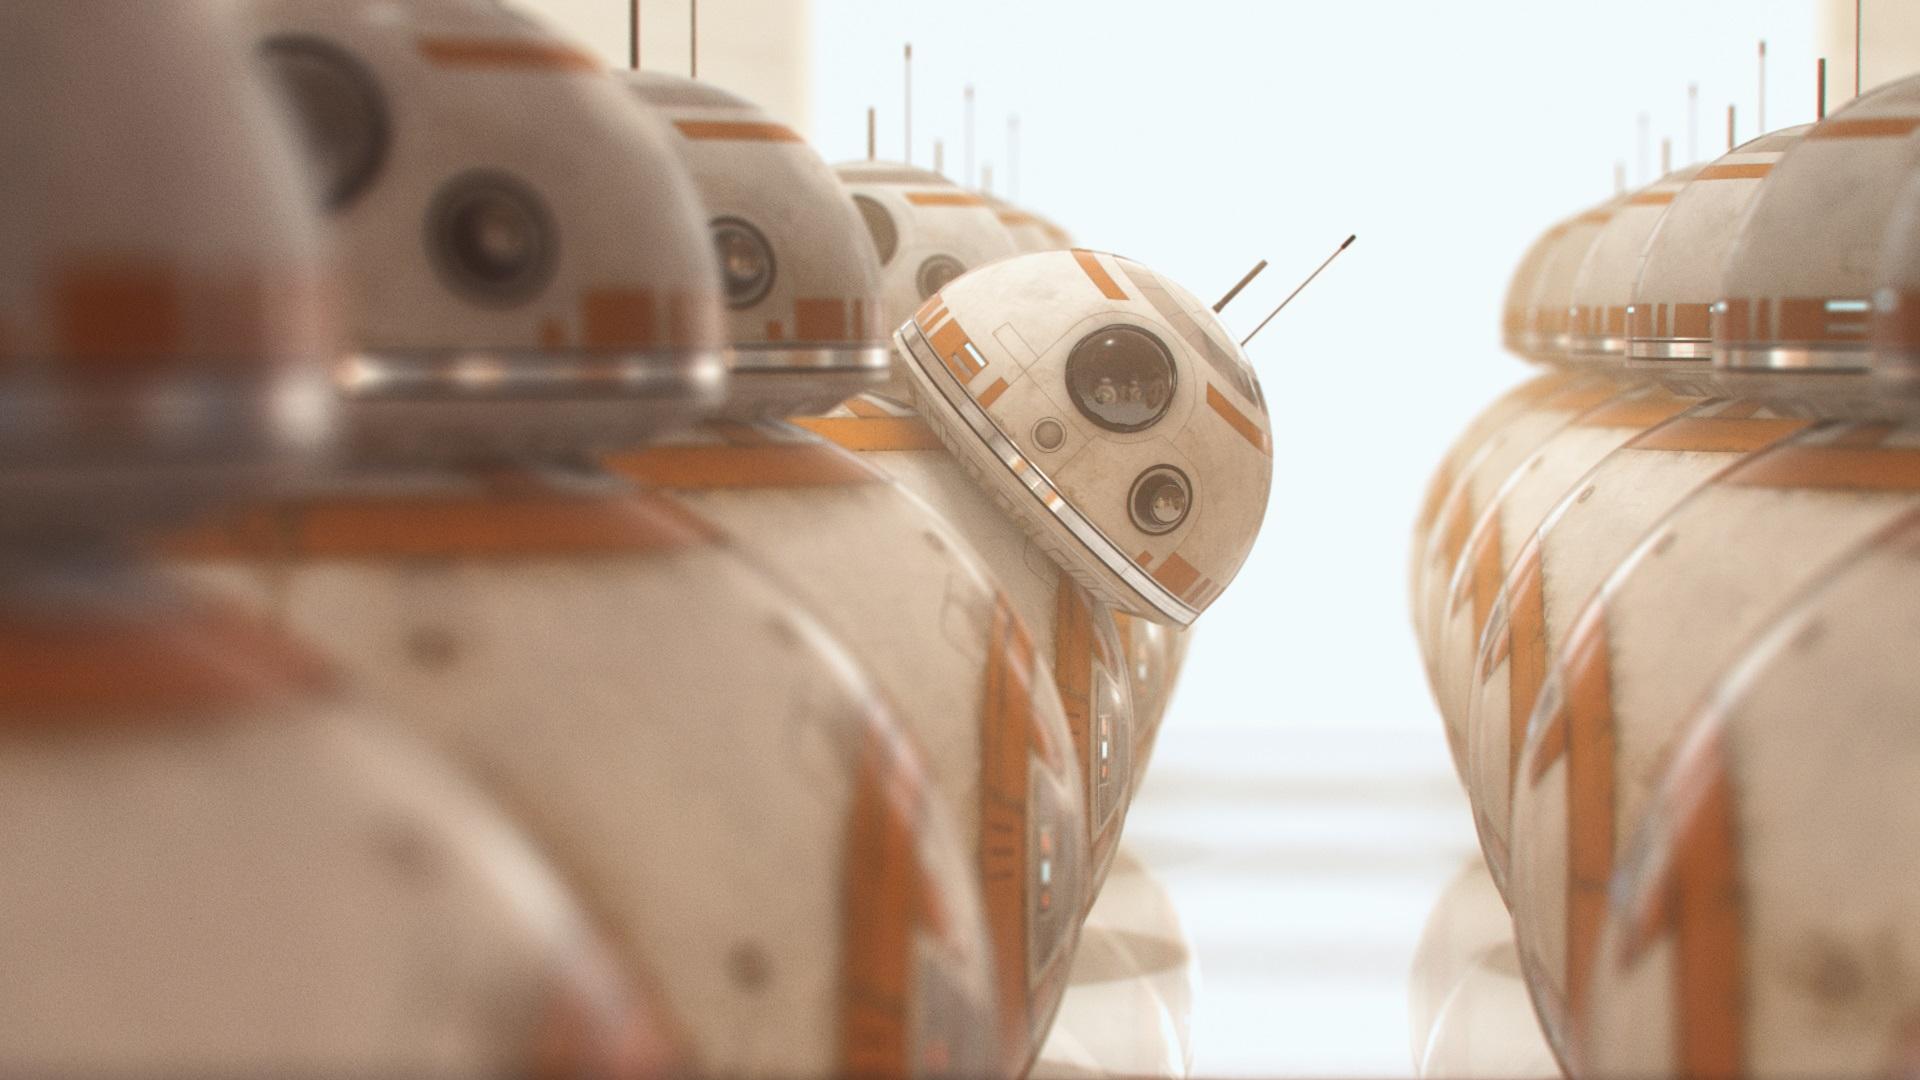 Wallpaper Bb8 Robots One Curious Star Wars 1920x1080 Full